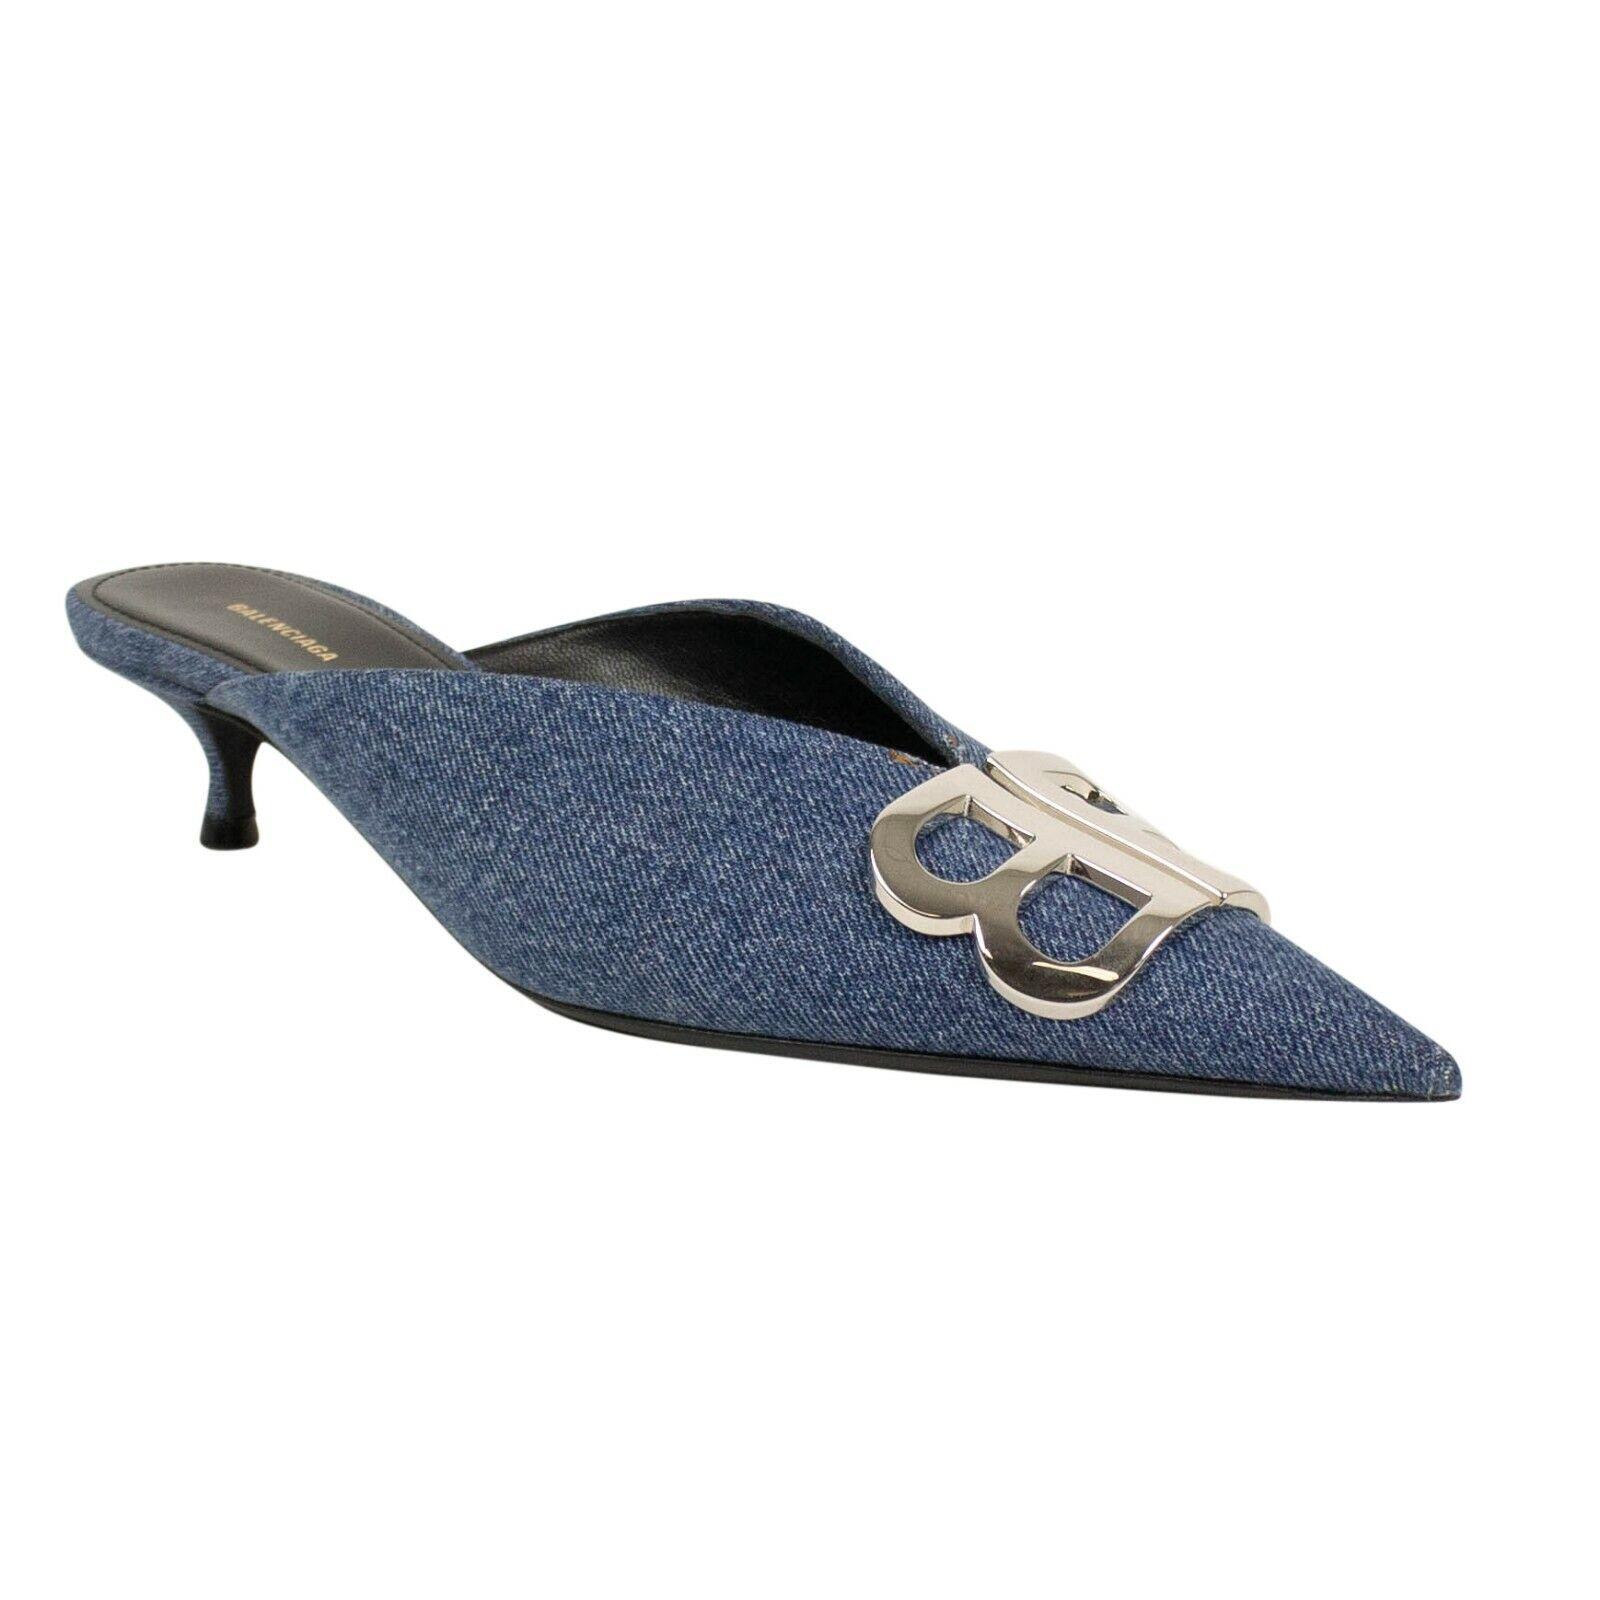 NIB BALENCIAGA bluee Vintage Denim Leather Kitten Heels Mules shoes Size 9.5 39.5